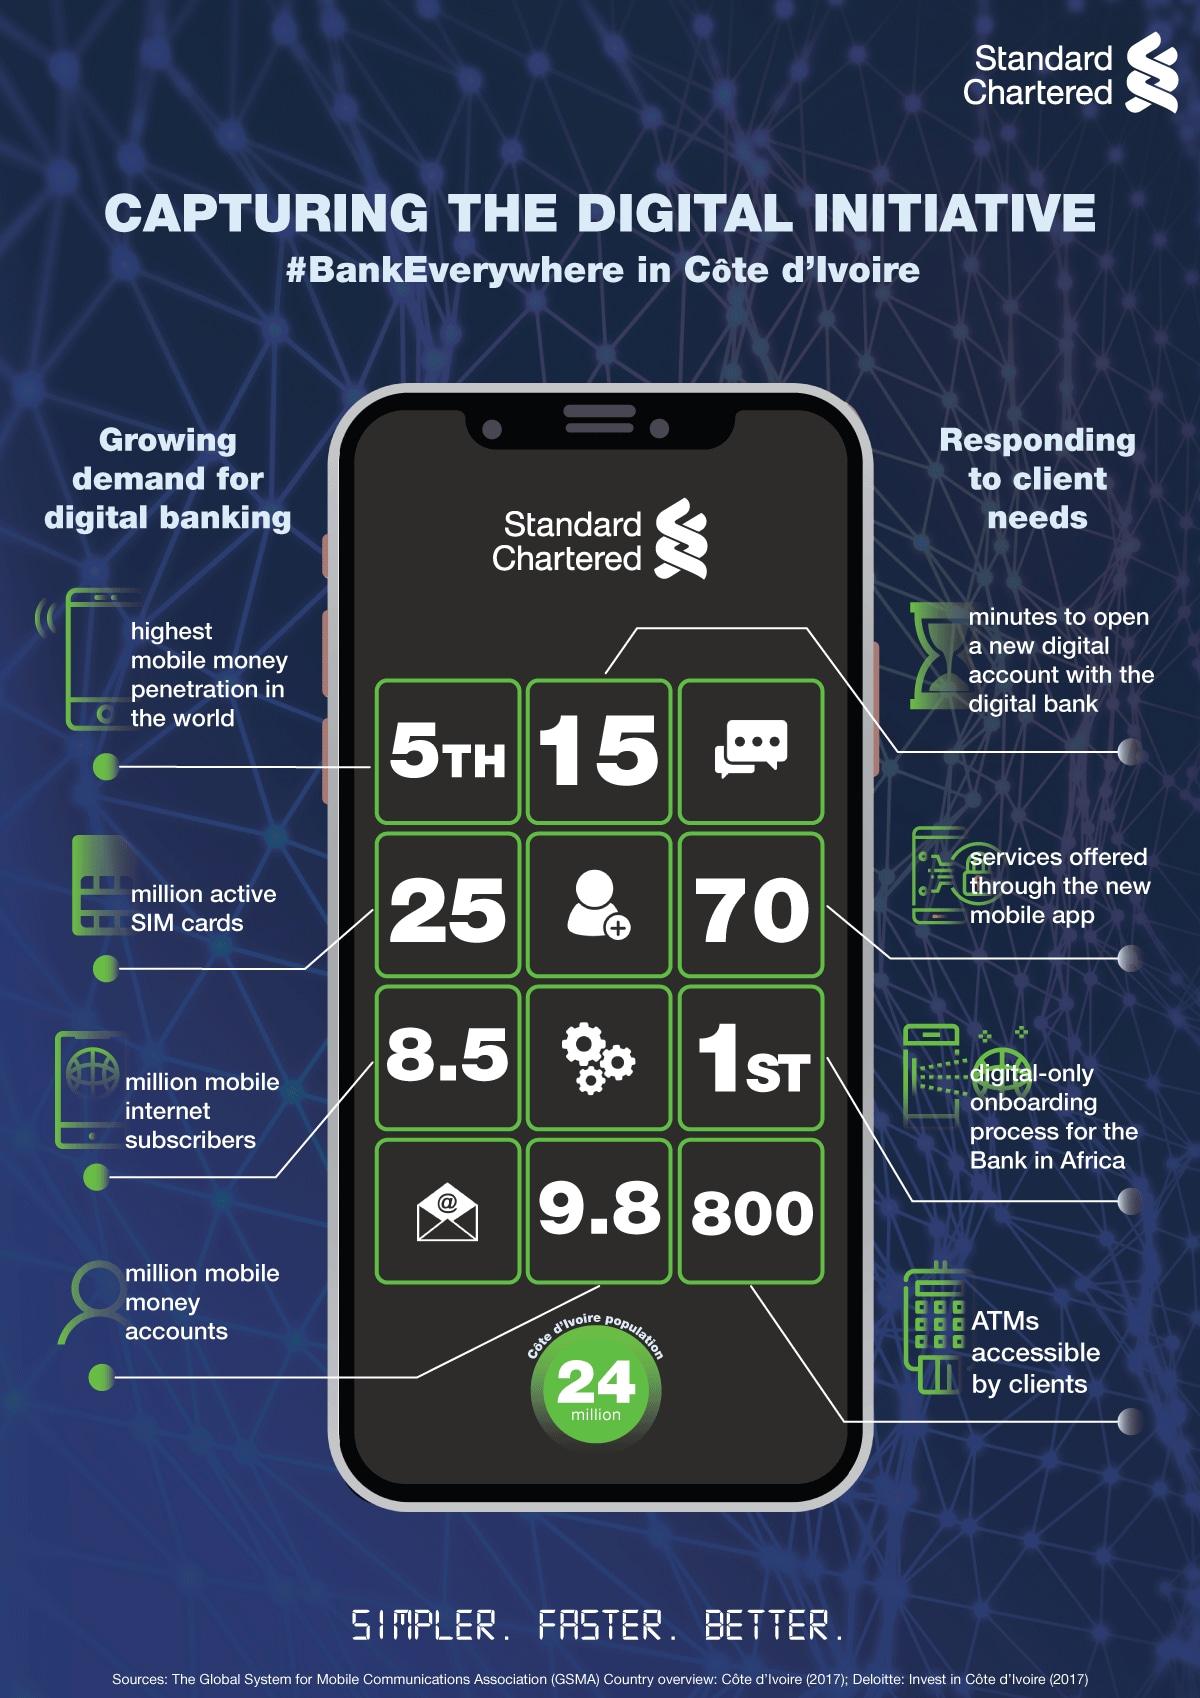 Infographic: Capturing the digital initiative